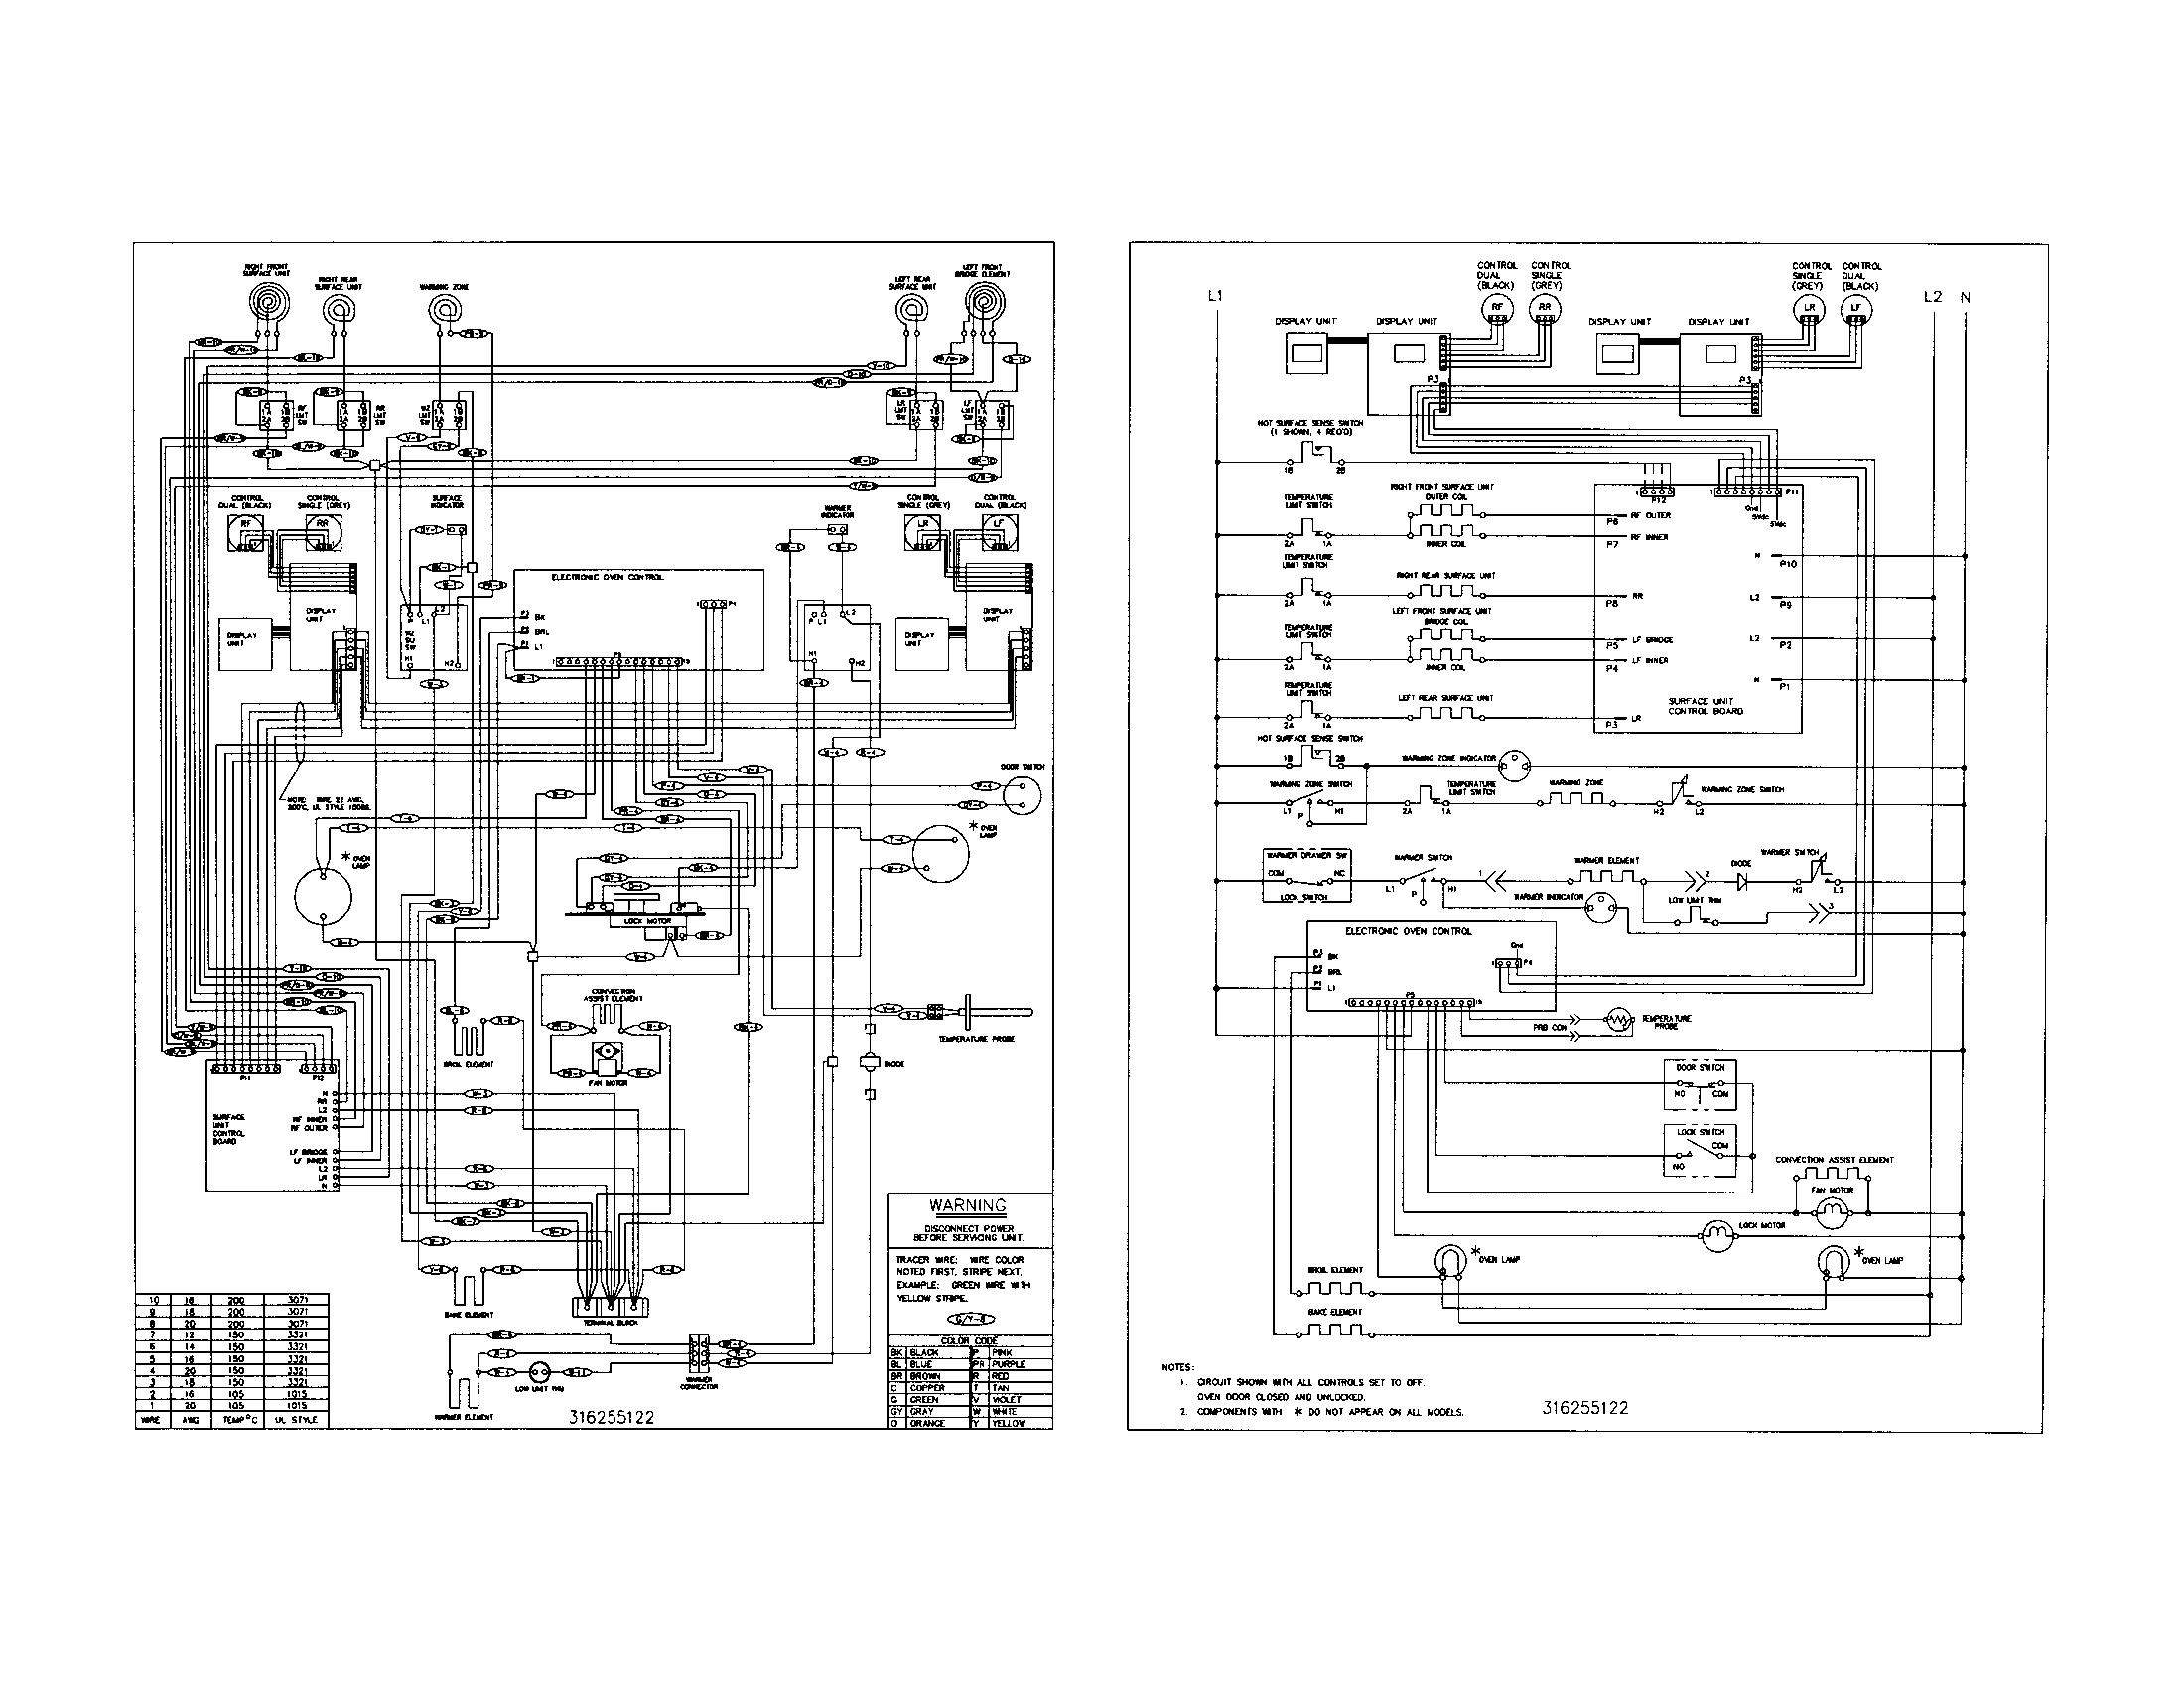 kenmore electric range model 79095661100